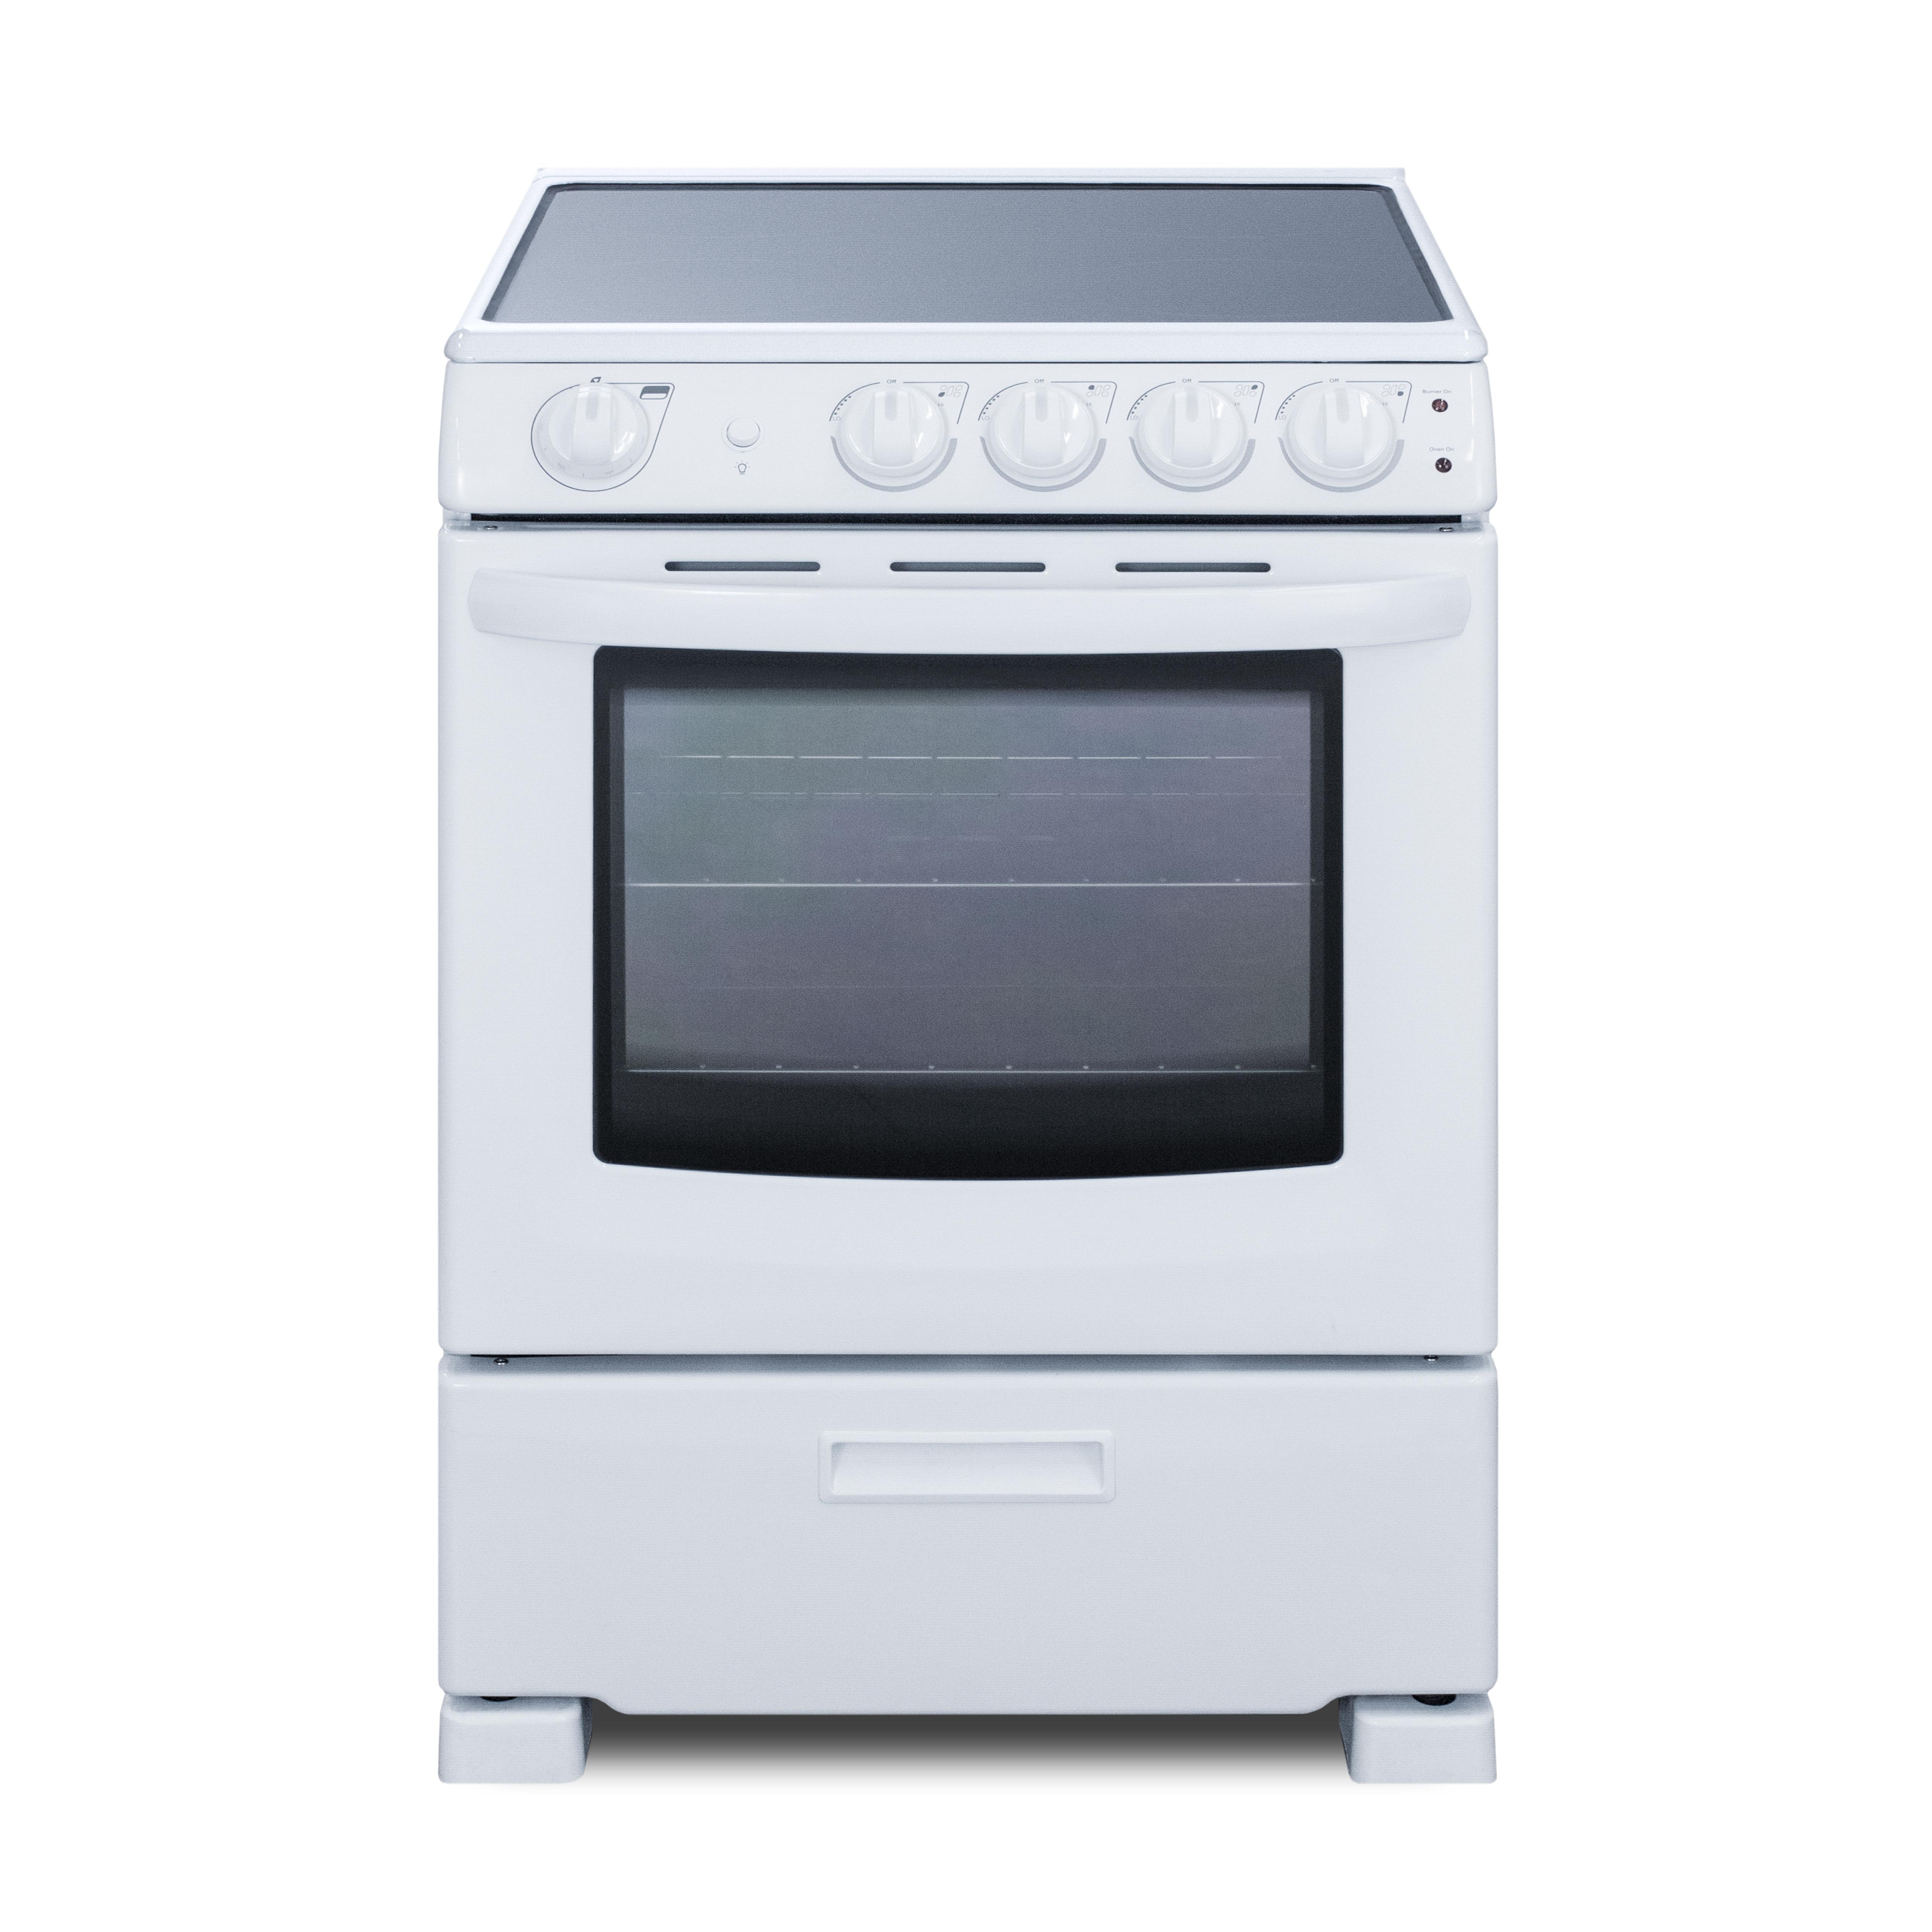 Summit Appliance REX2421WRT range, residential domestic